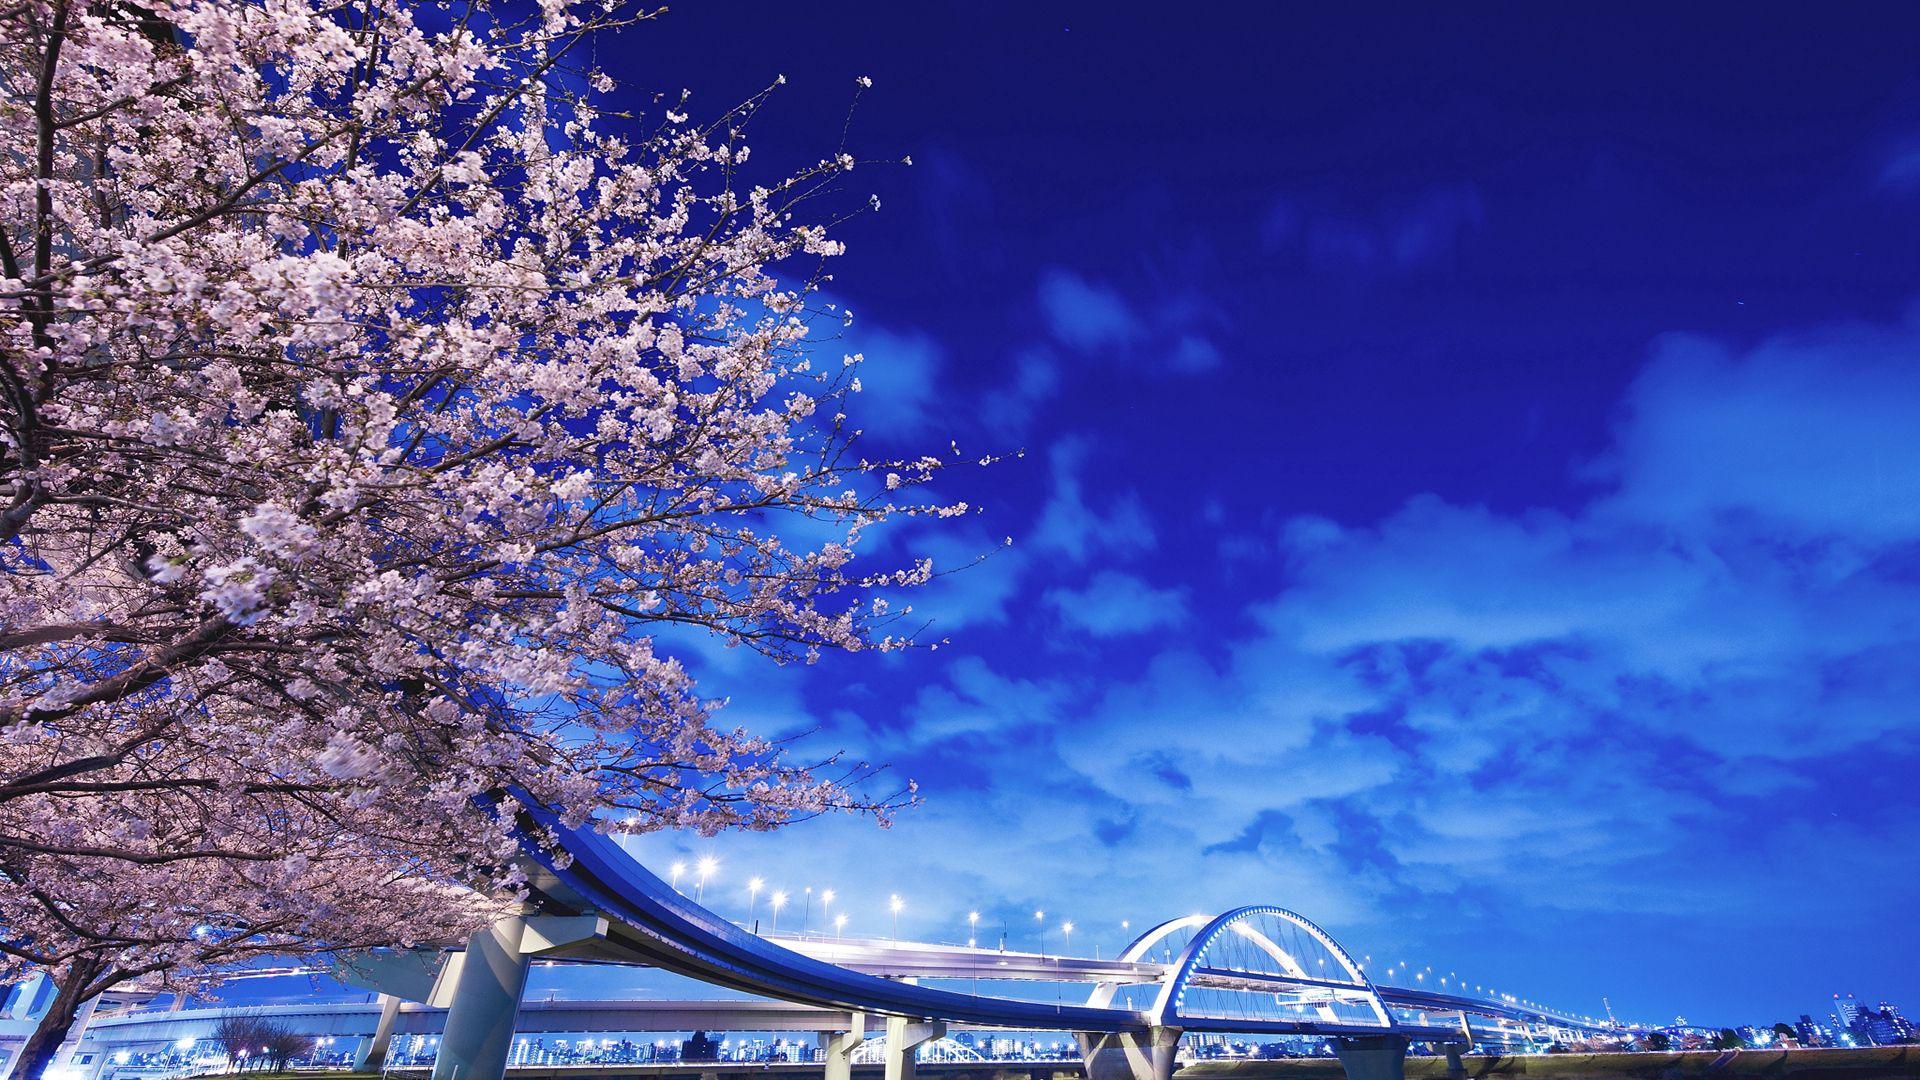 147192 Screensavers and Wallpapers Sakura for phone. Download Cities, Sakura, Bridge, Japan, Hokkaido pictures for free